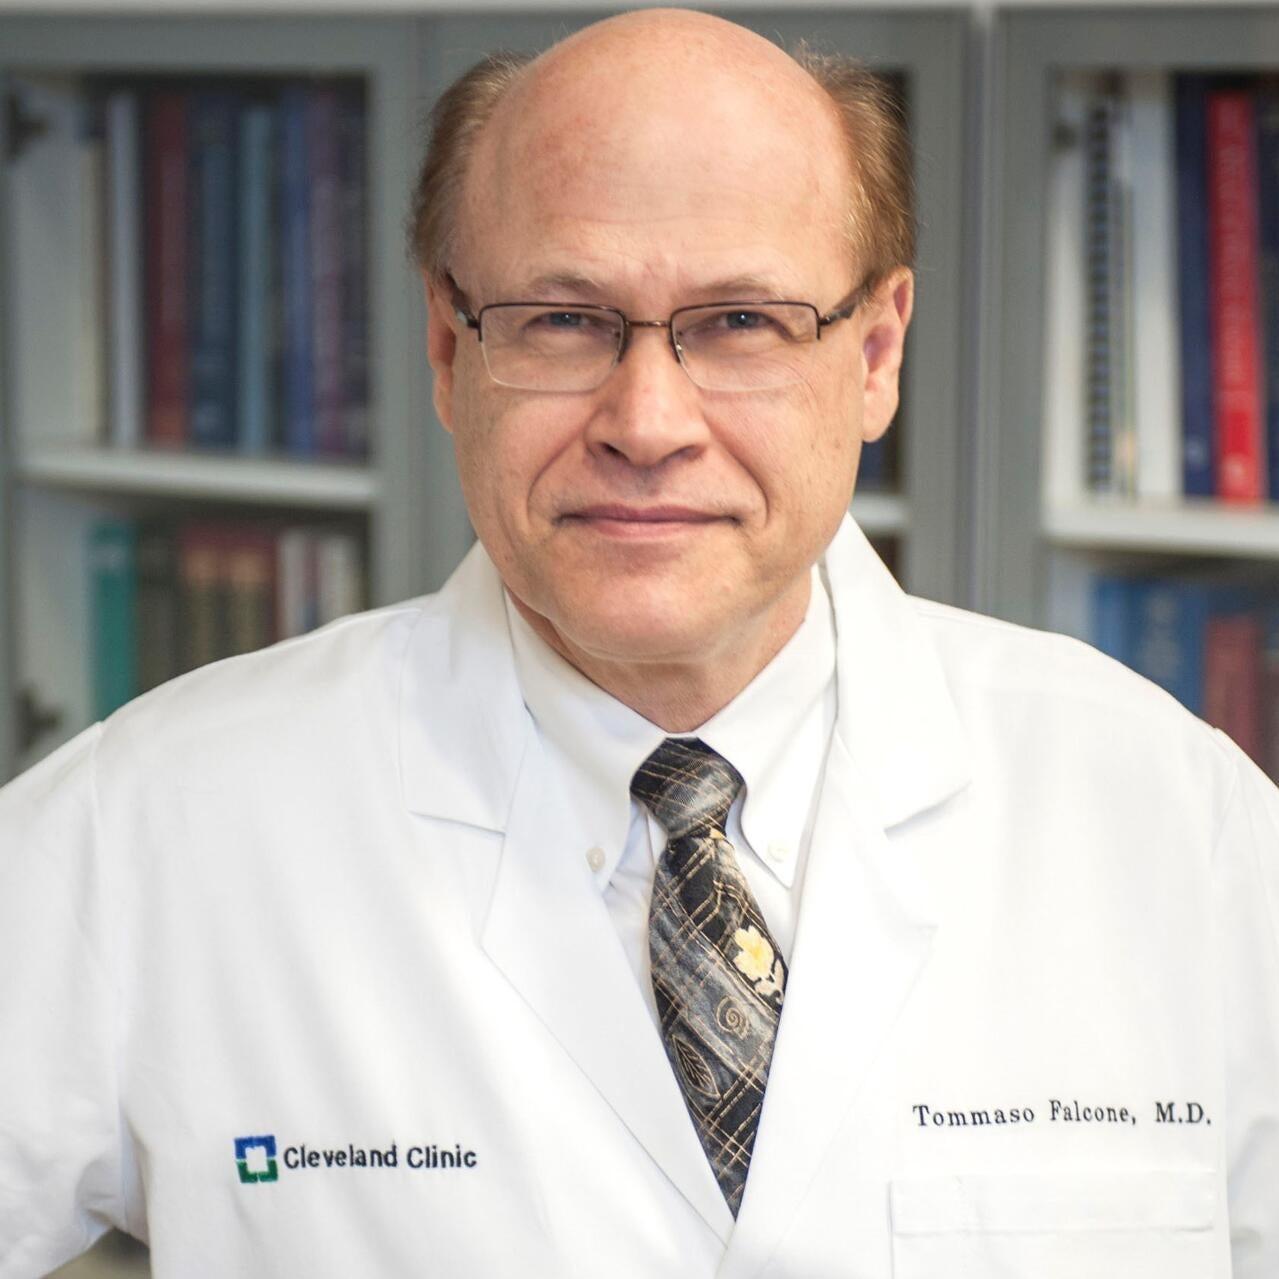 Prof. Tommaso Falcone